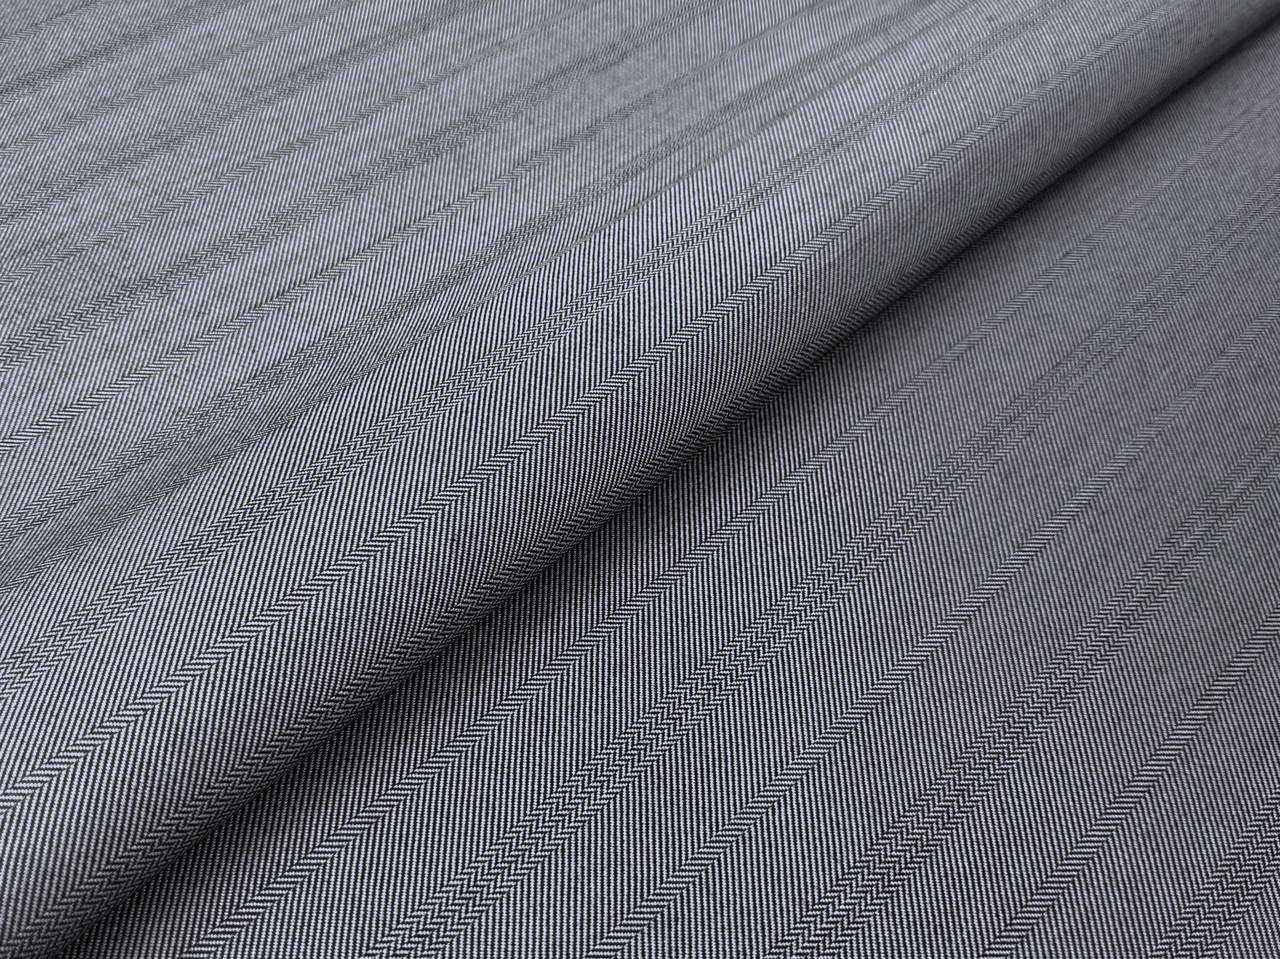 Ткань Костюмная Вива полоска елочка 25 мм, серый